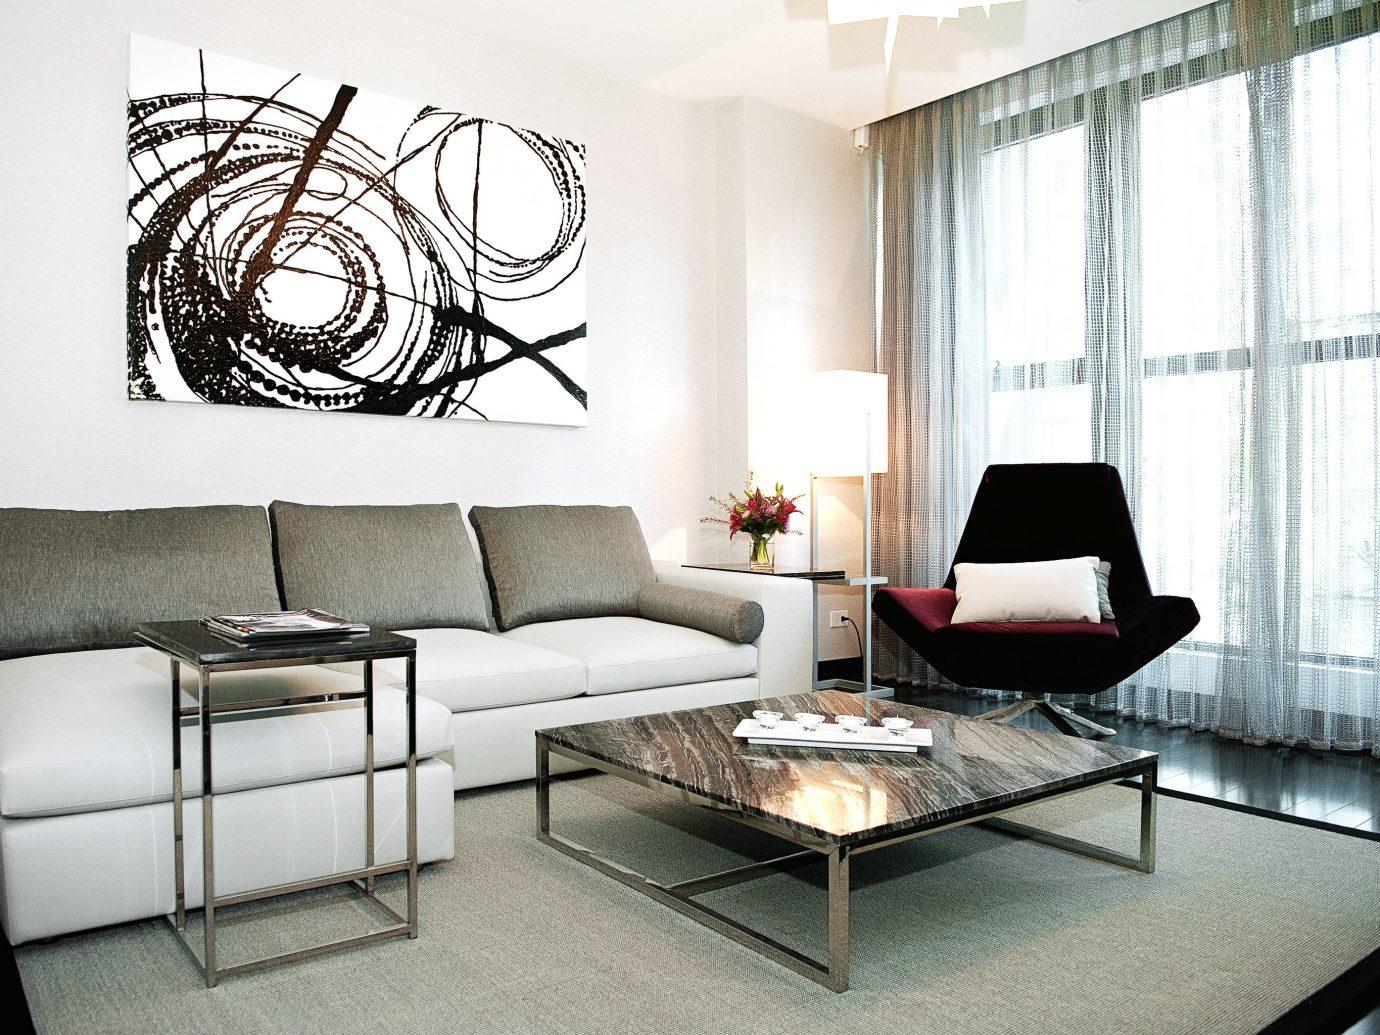 Boutique Hotels Chicago Hotels indoor floor room wall Living sofa living room property interior design furniture home Design condominium window covering apartment lamp area leather